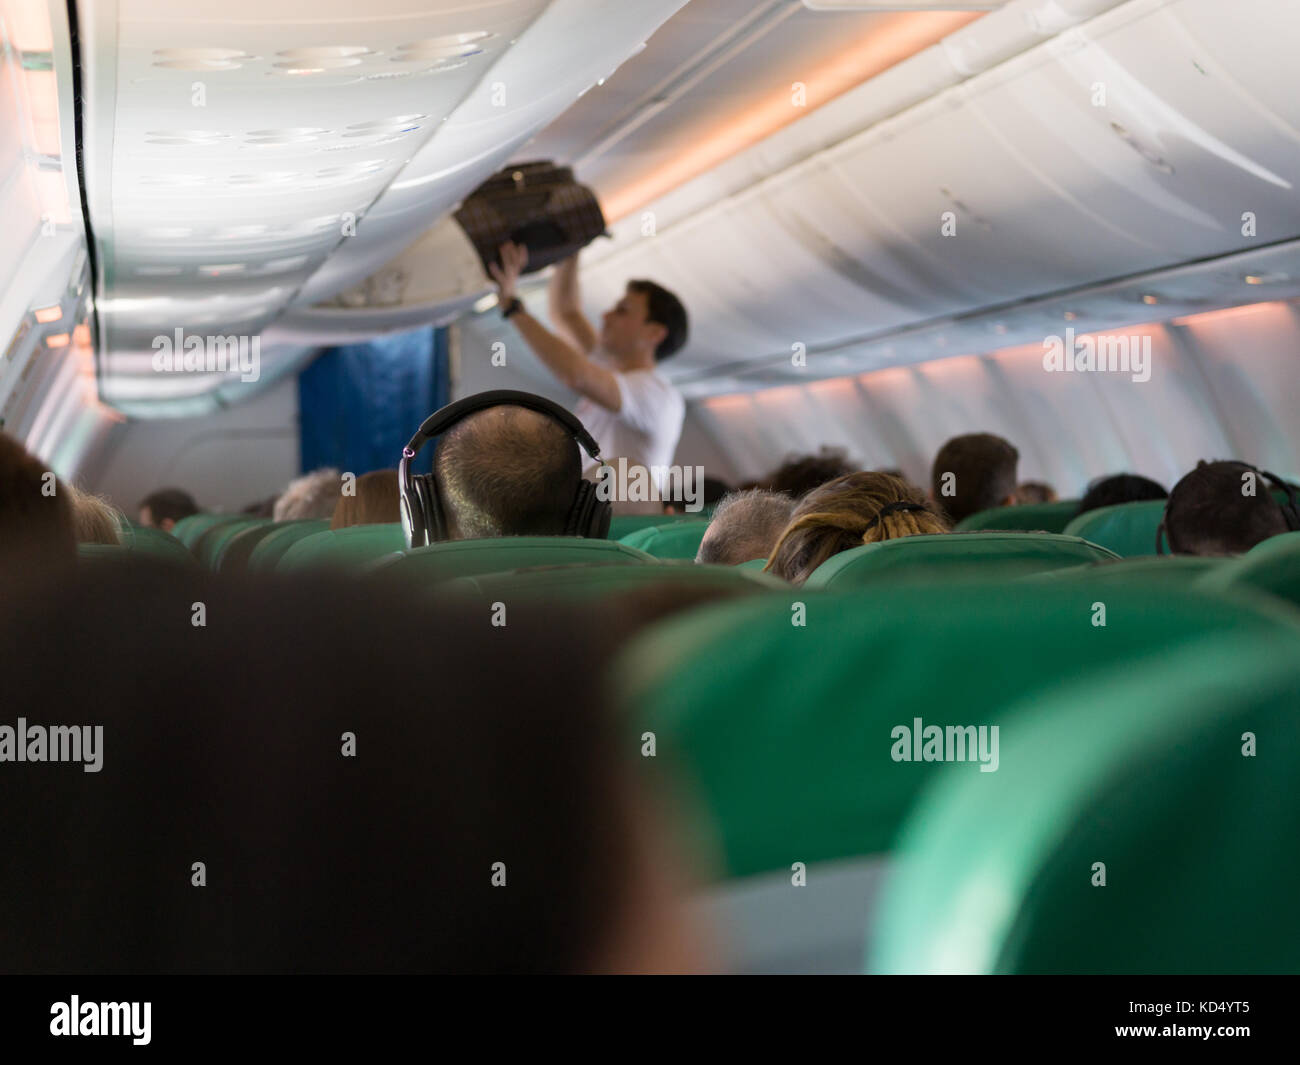 airplane interior - people sitting on seats, wideshot - Stock Image